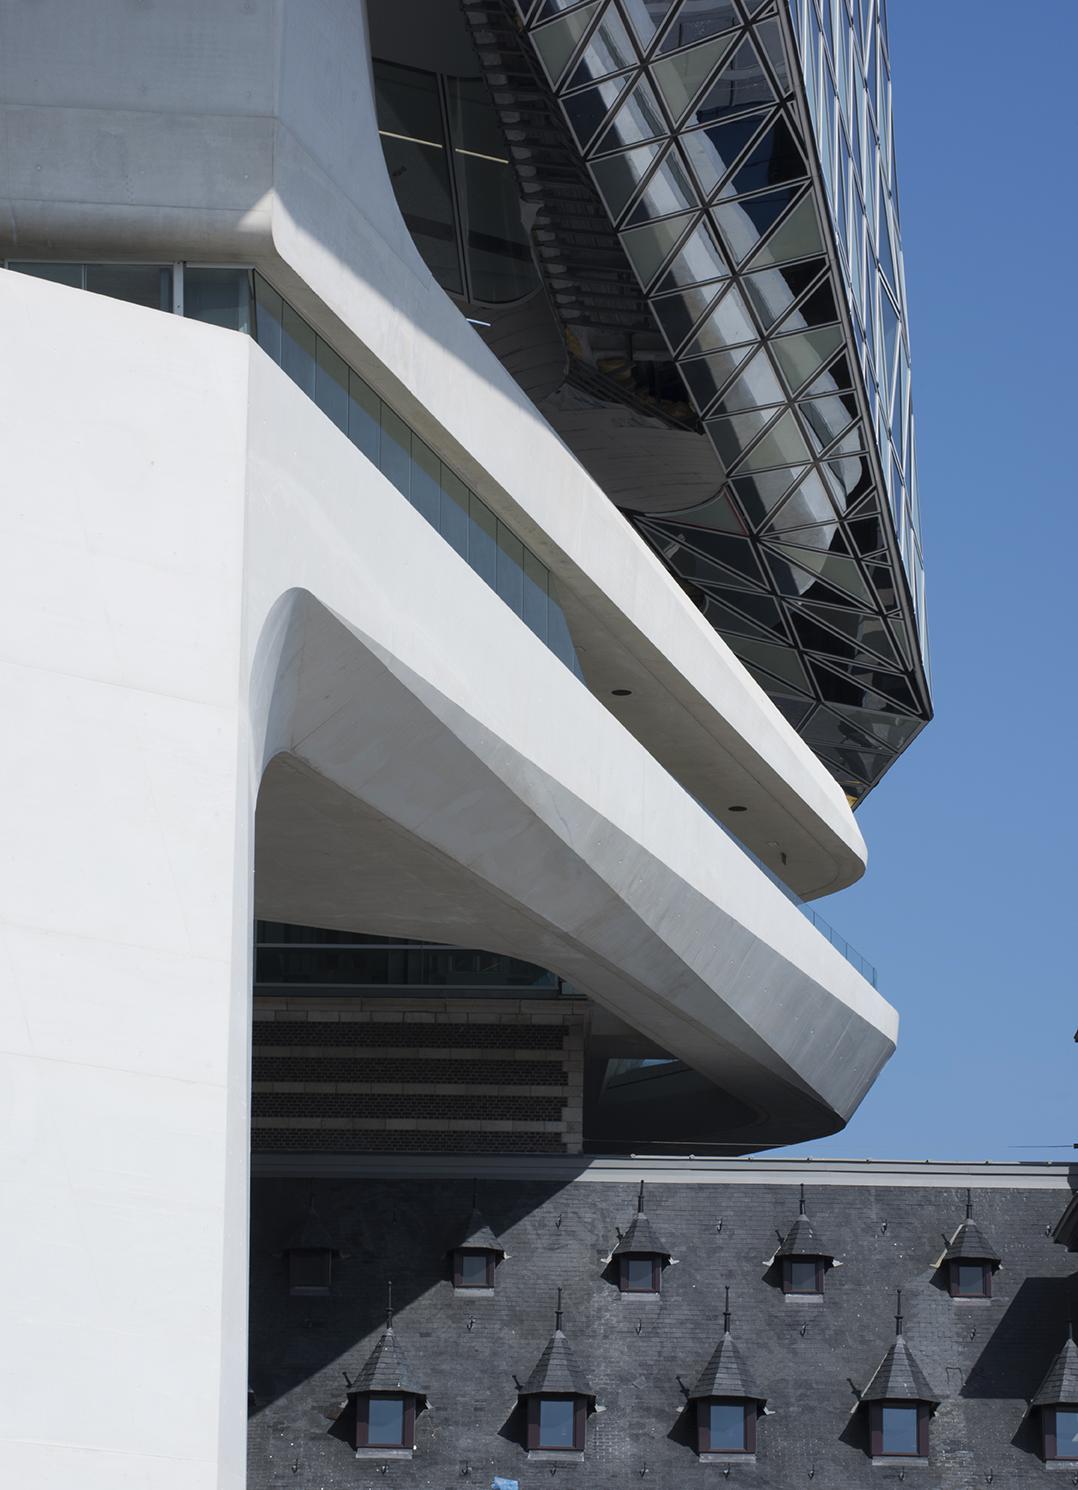 Detail of concrete structure